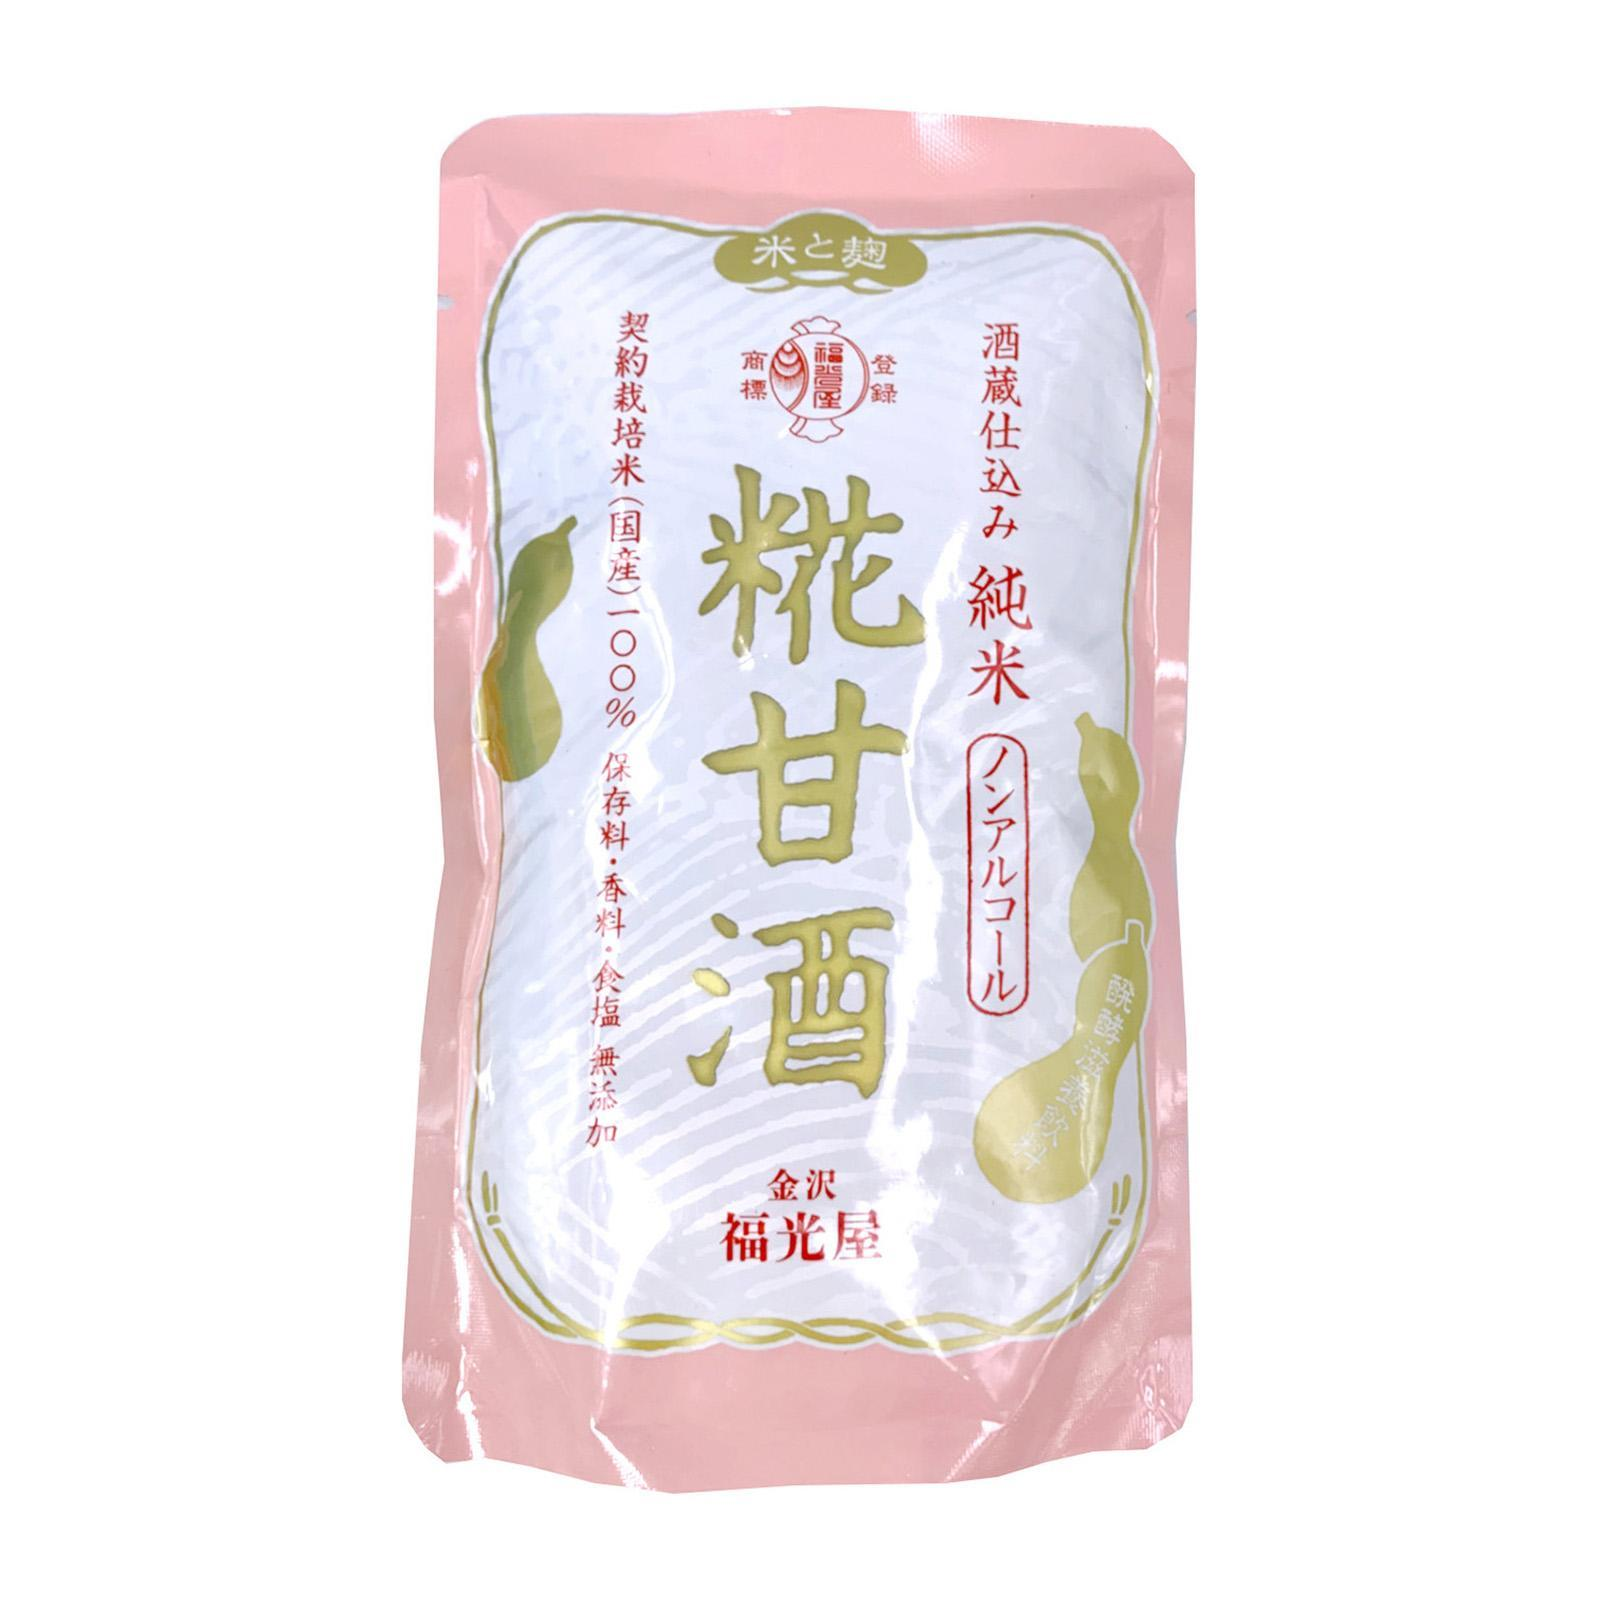 Fukumitsuya Premium Junmai Silky Amazake (Rice Base Cultured Drink) Pouch